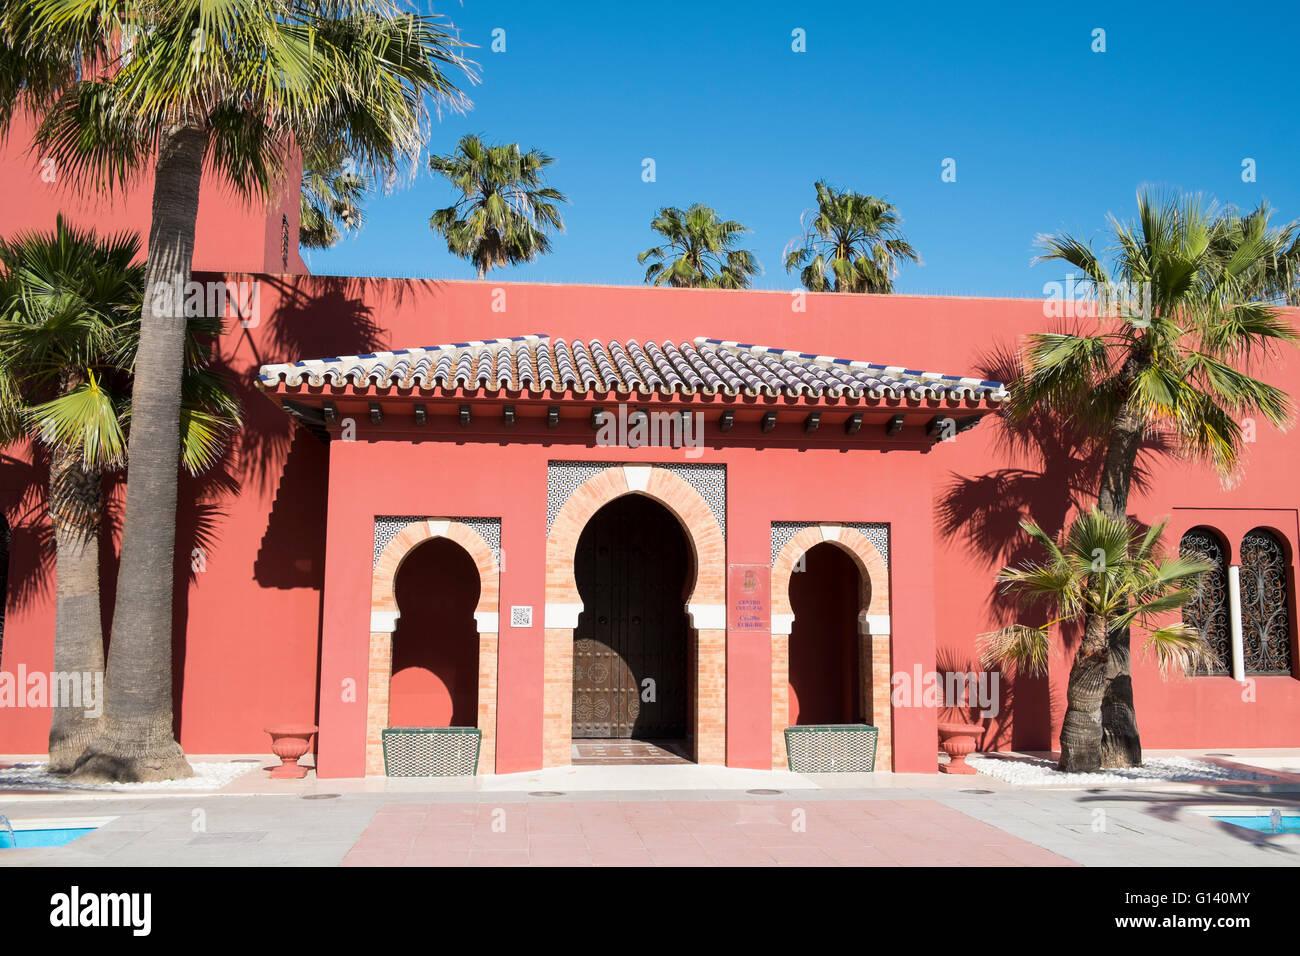 Castillo Bil Bil. Benalmádena costa, Málaga, Spain - Stock Image